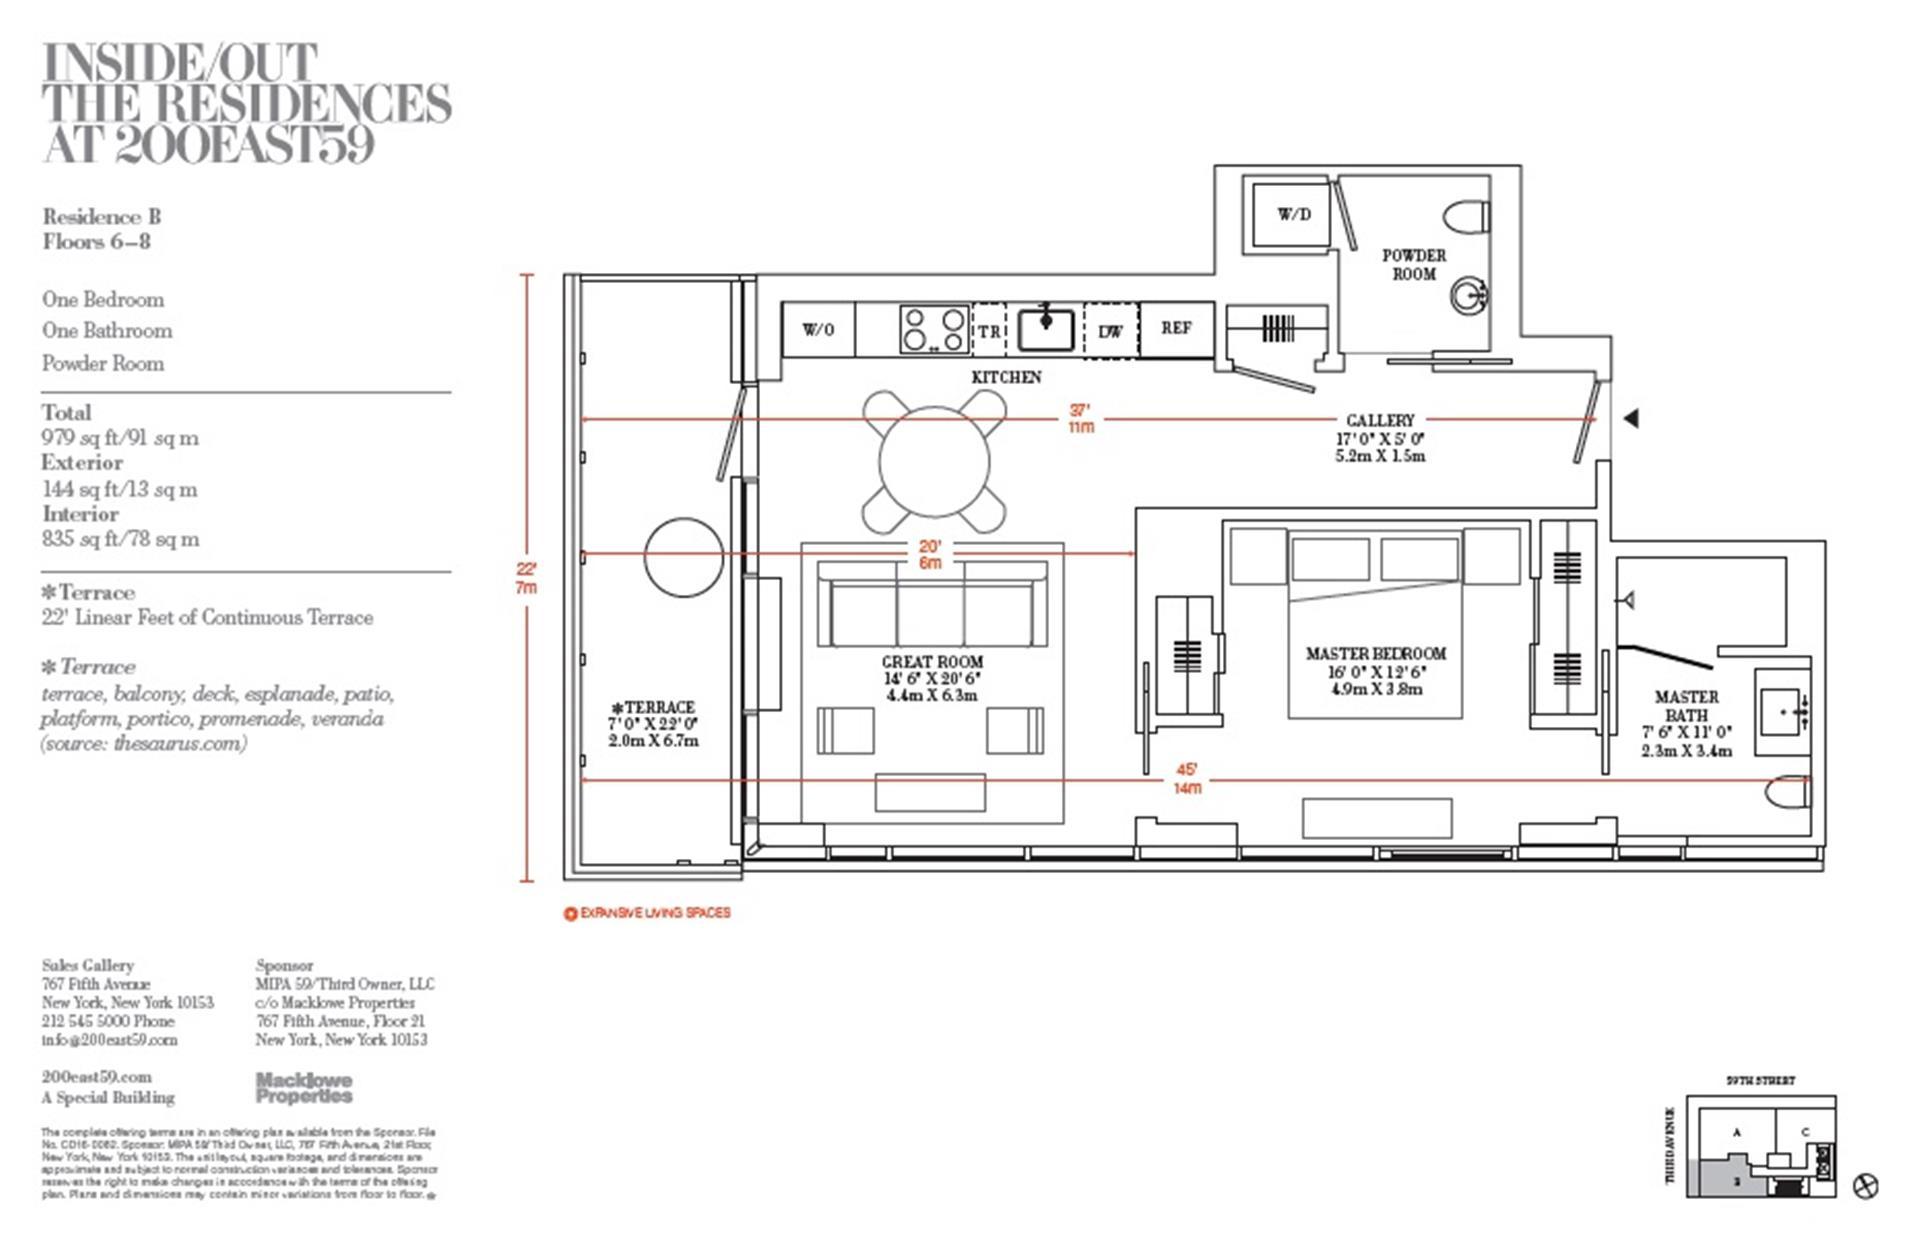 Floor plan of 200 East 59th St, 5B - Midtown, New York